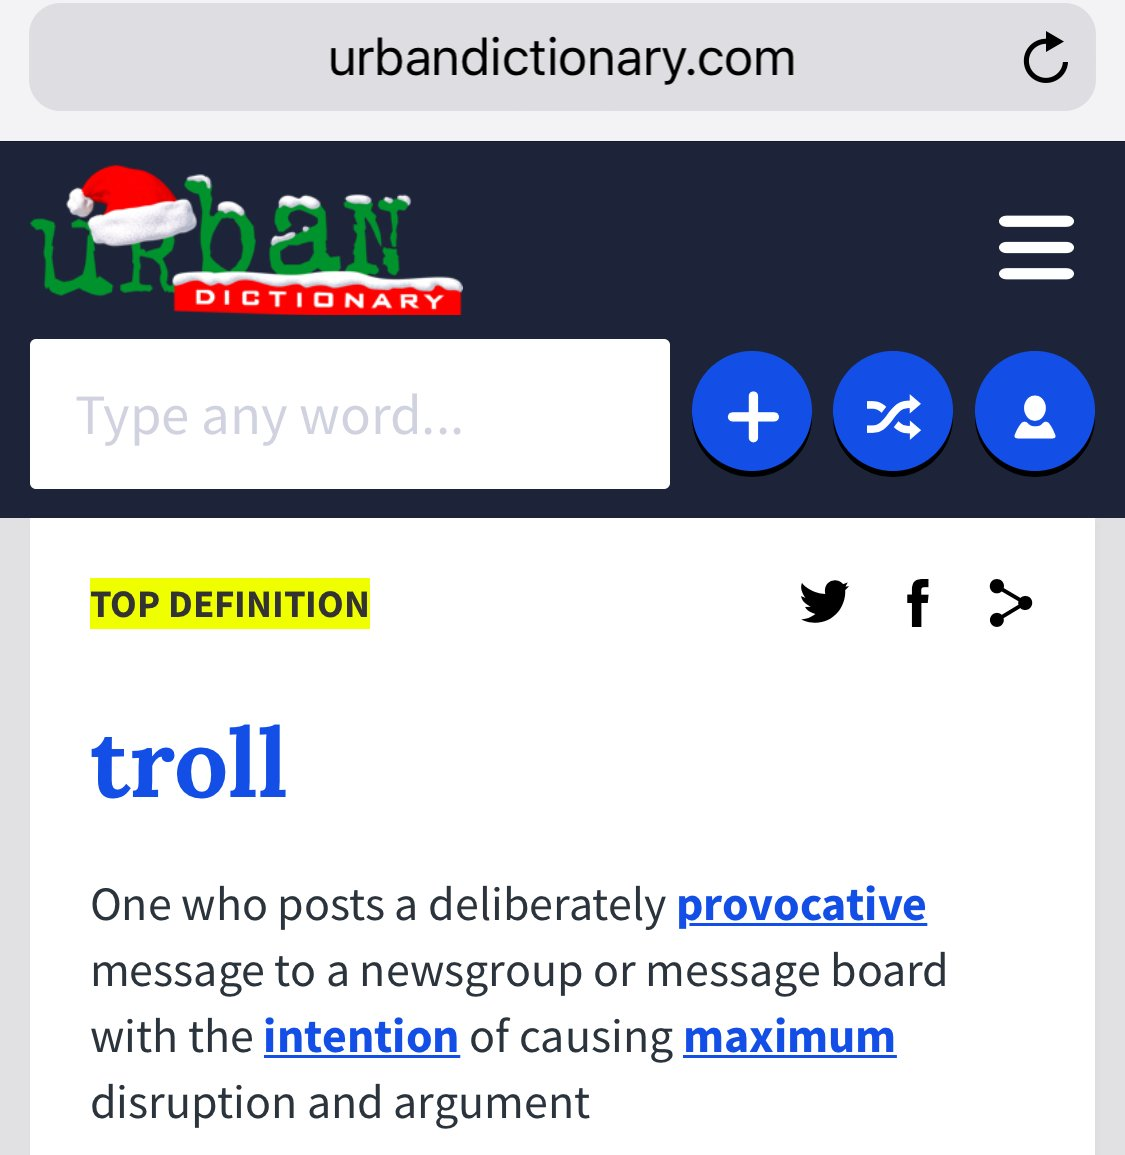 Provocative urban dictionary